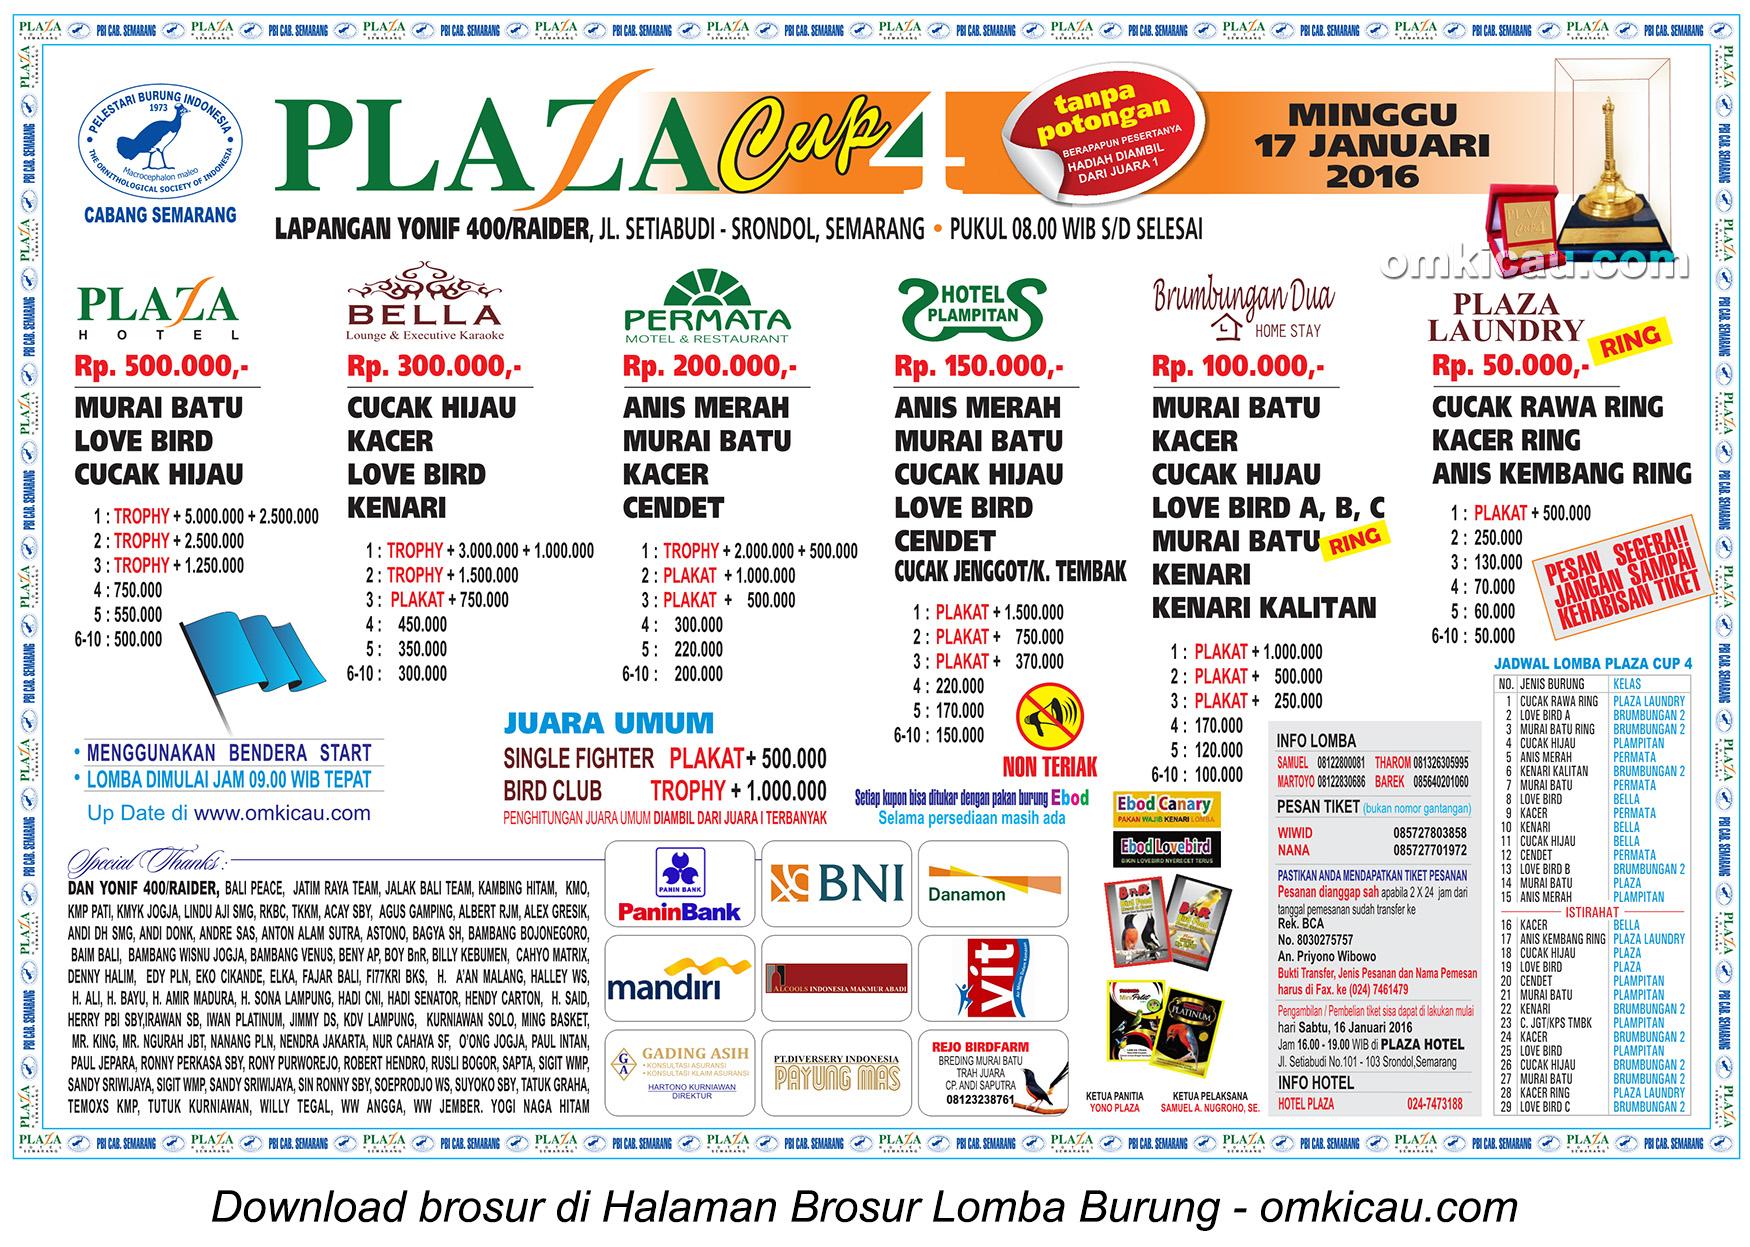 Brosur Lomba Burung Berkicau Plaza Cup 4, Semarang, Minggu 17 Januari 2016